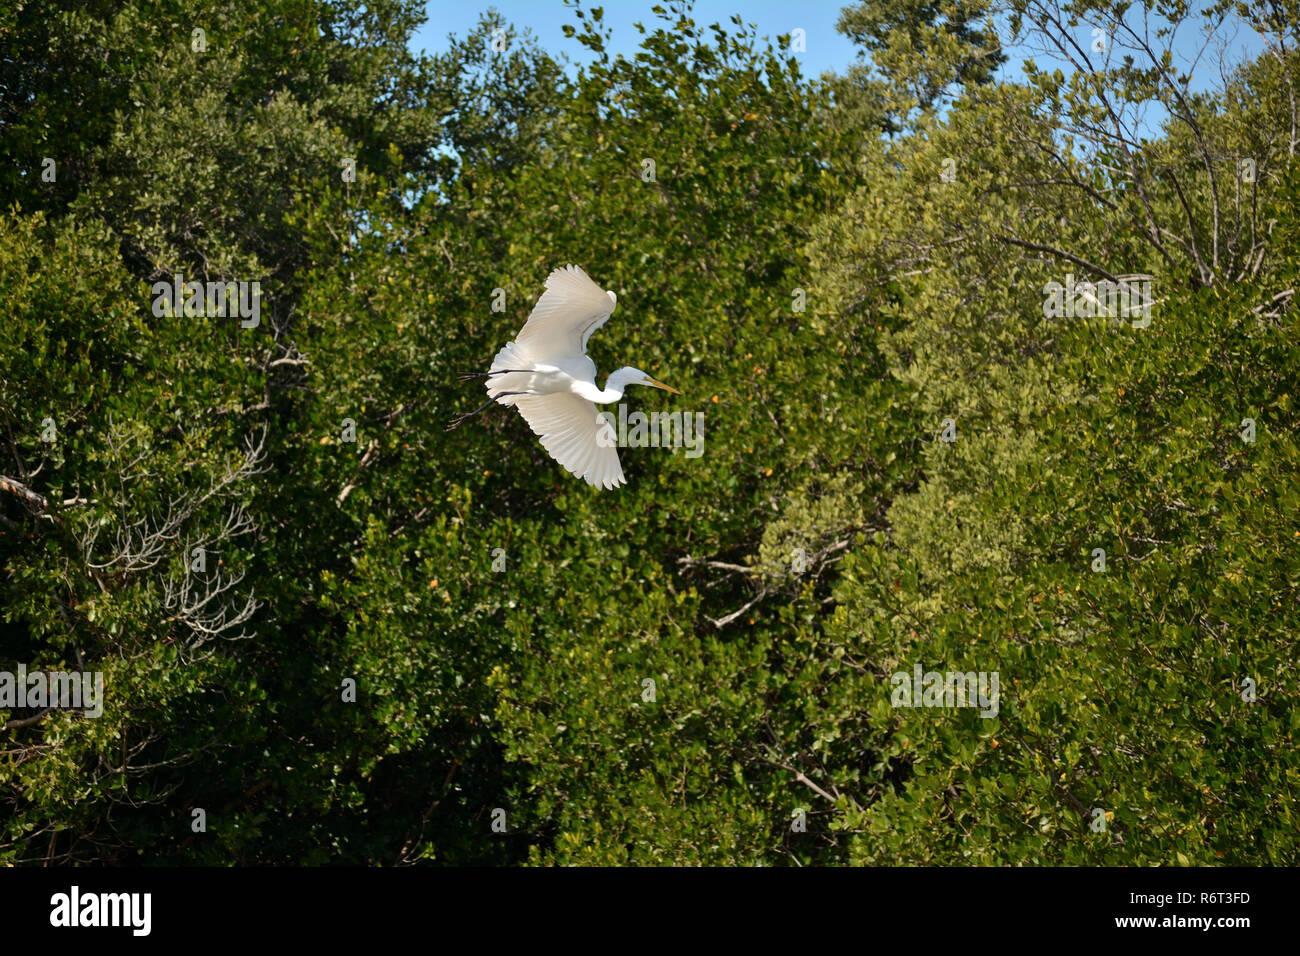 Snowy egret seen flying alongside Wildlife Drive in the J.N. 'Ding' Darling Wildlife Refuge on Sanibel Island, Florida US. - Stock Image